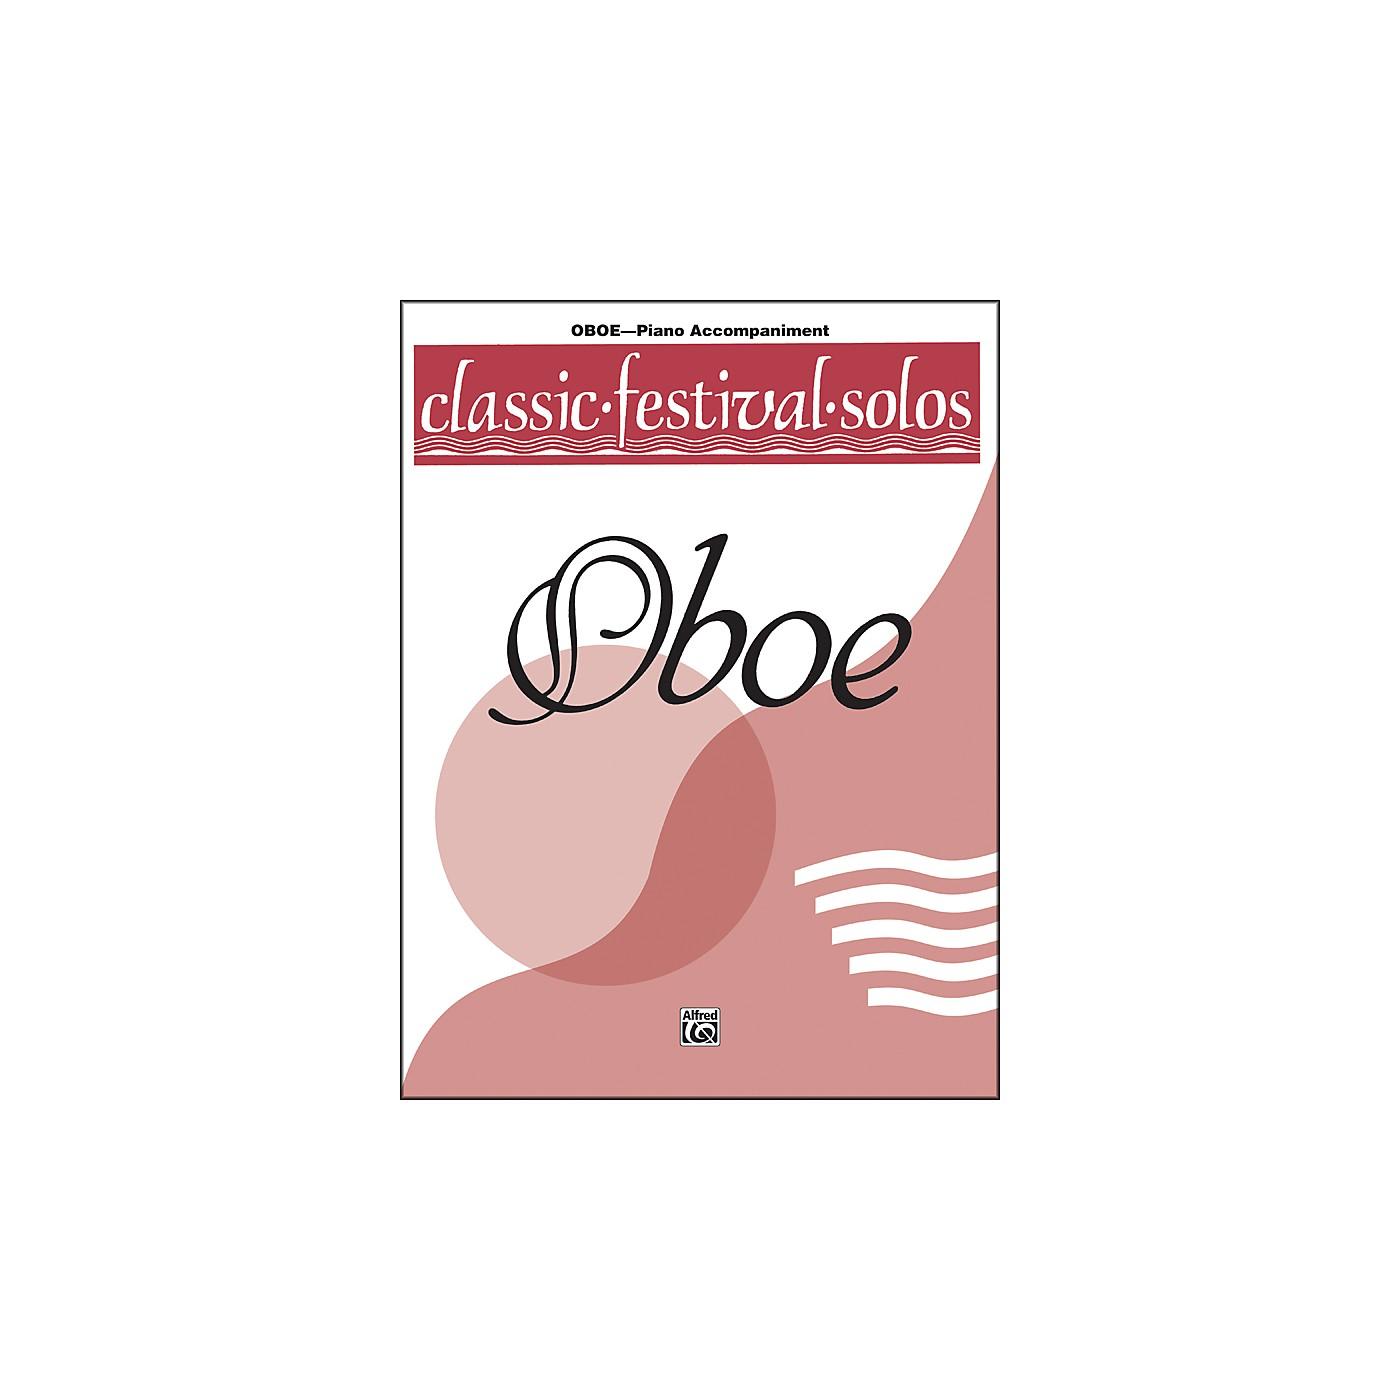 Alfred Classic Festival Solos (Oboe) Volume 1 Piano Acc. thumbnail